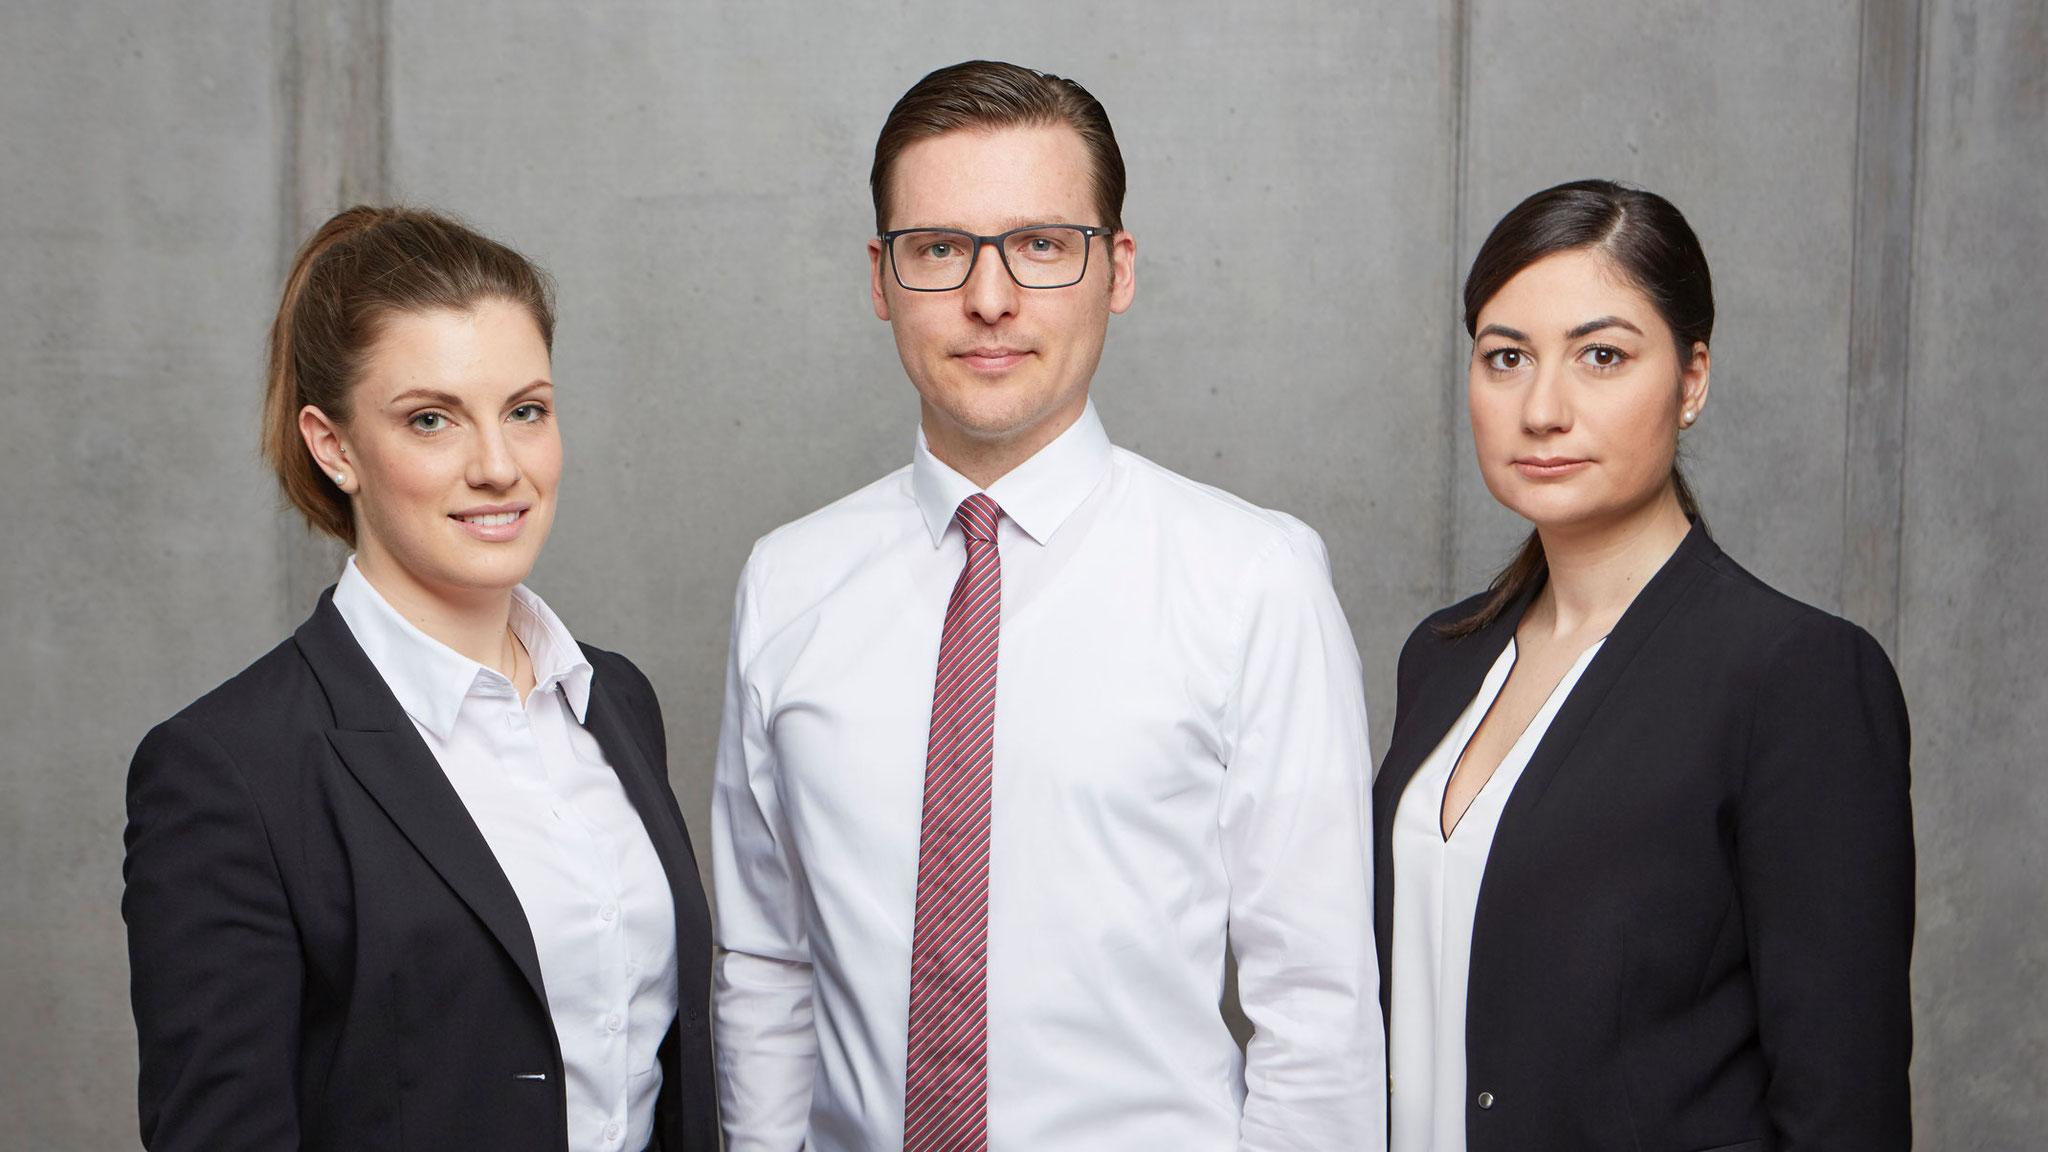 Team Law